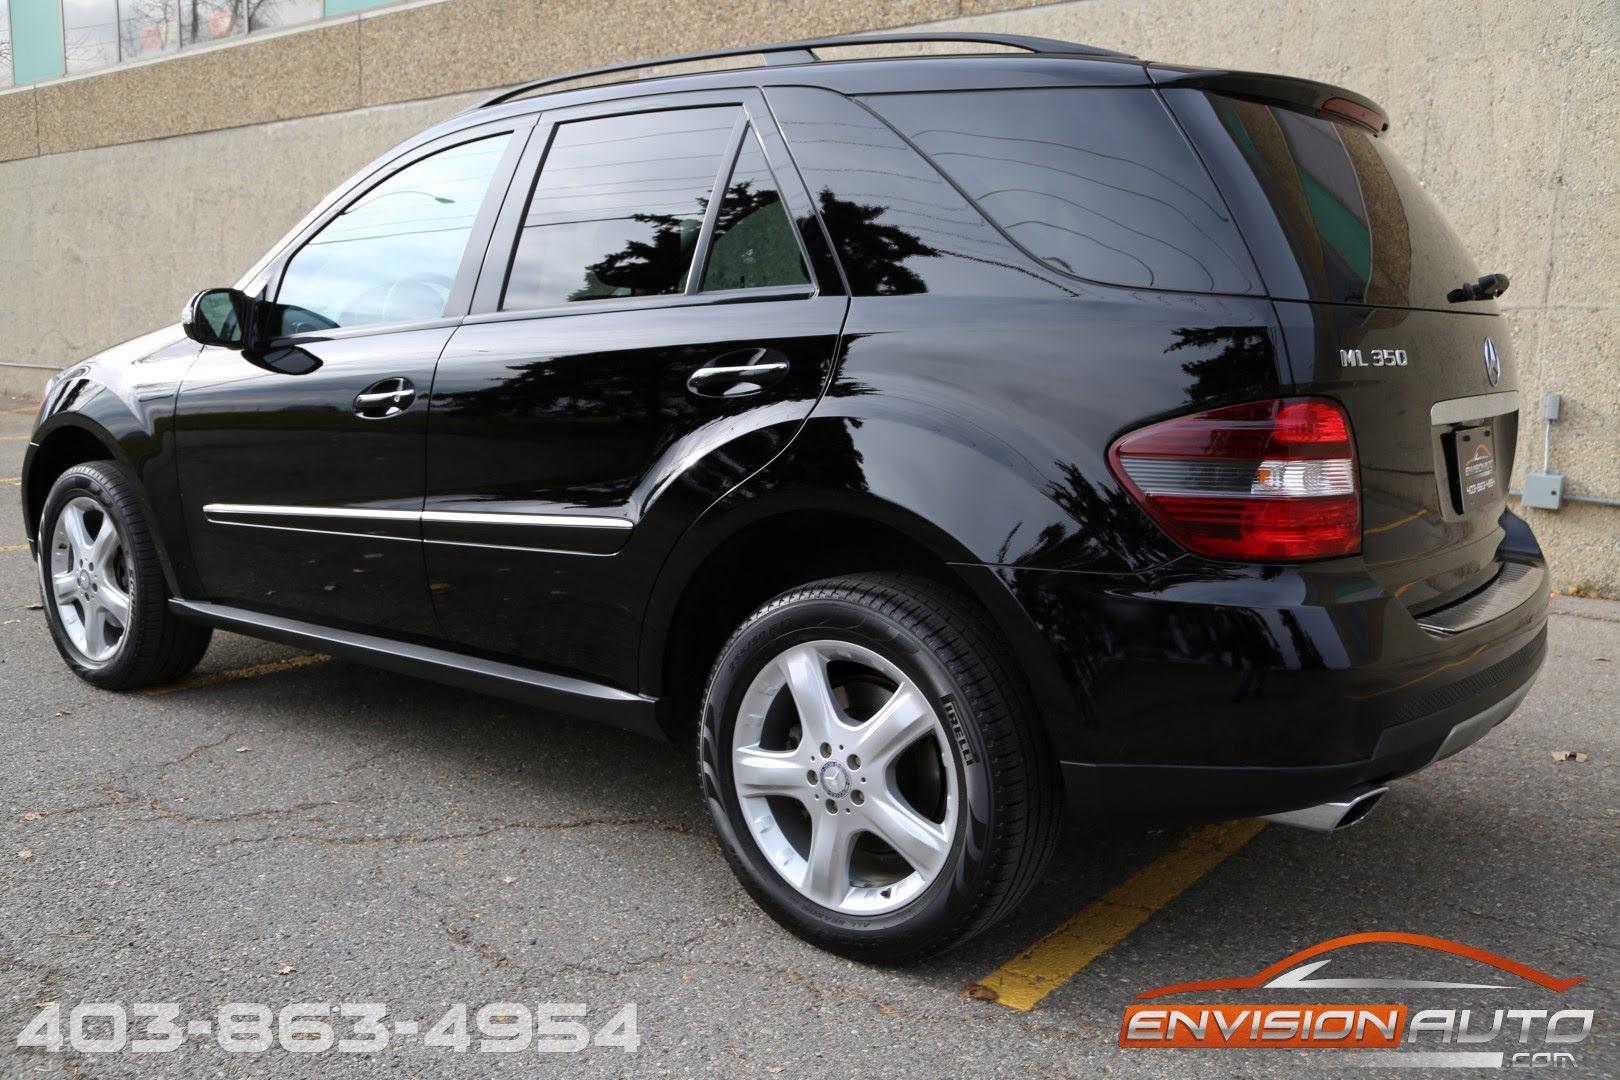 2008 Mercedes-Benz ML350 4Matic   Envision Auto - Calgary ...